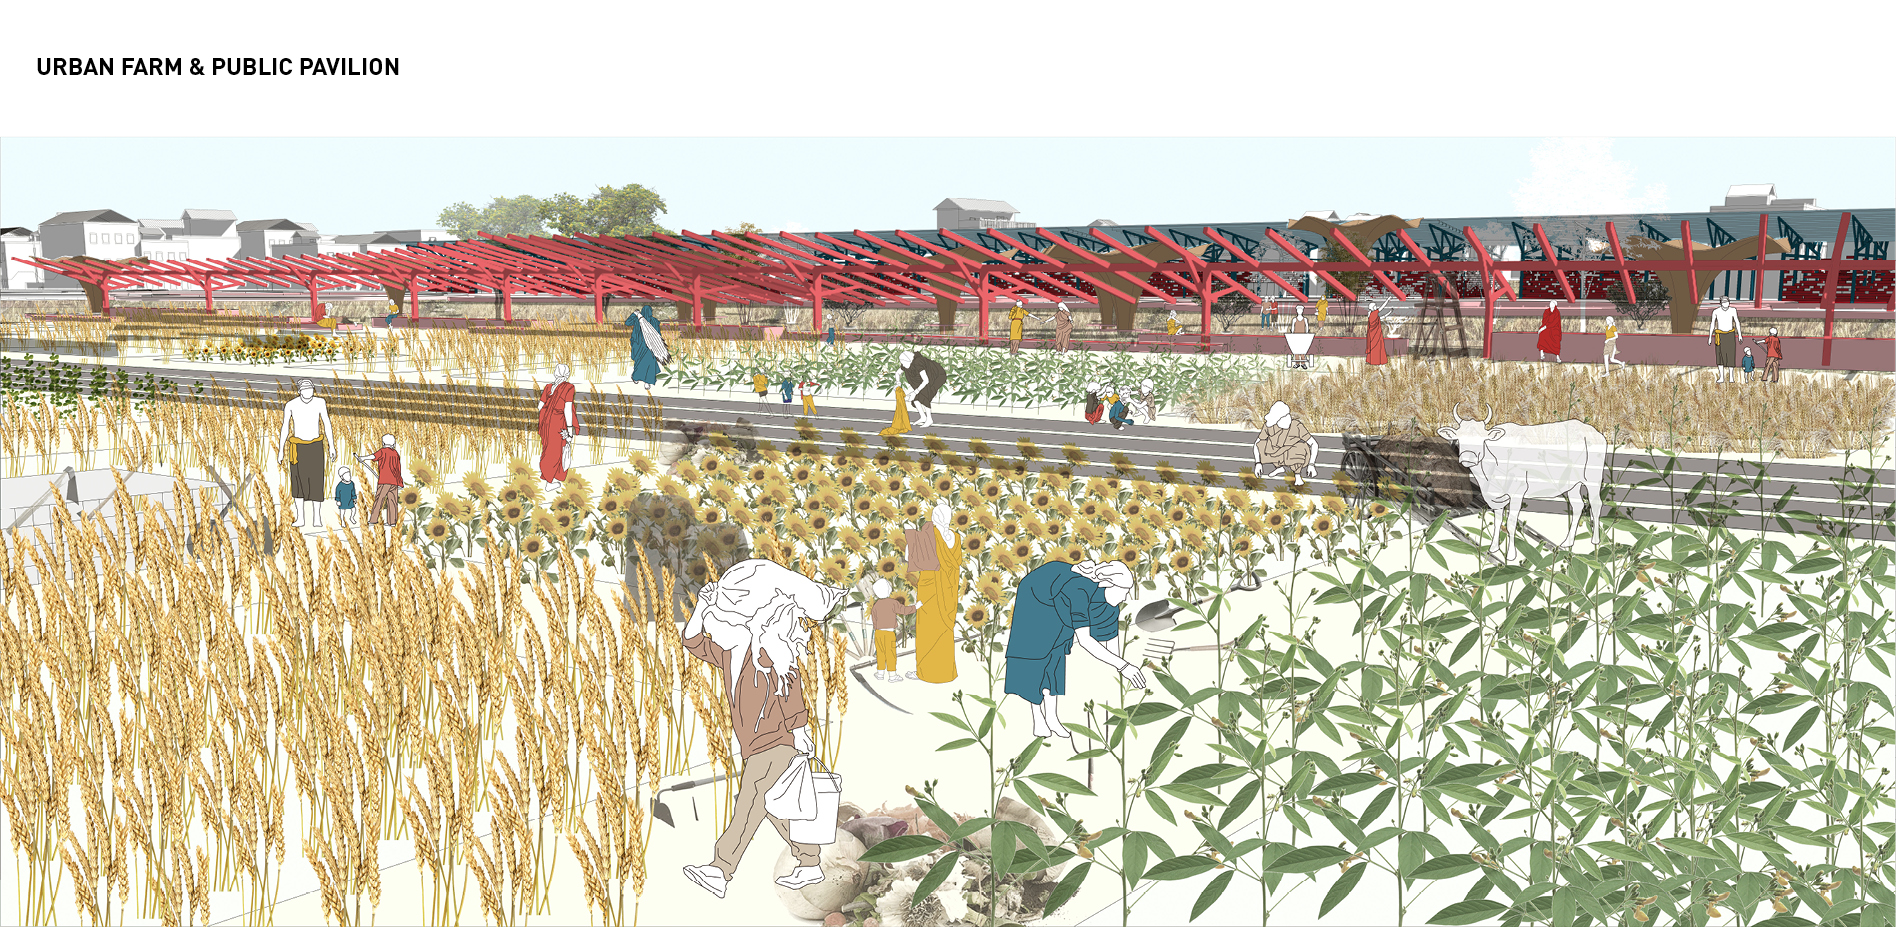 Vision for Type C: Urban Farm